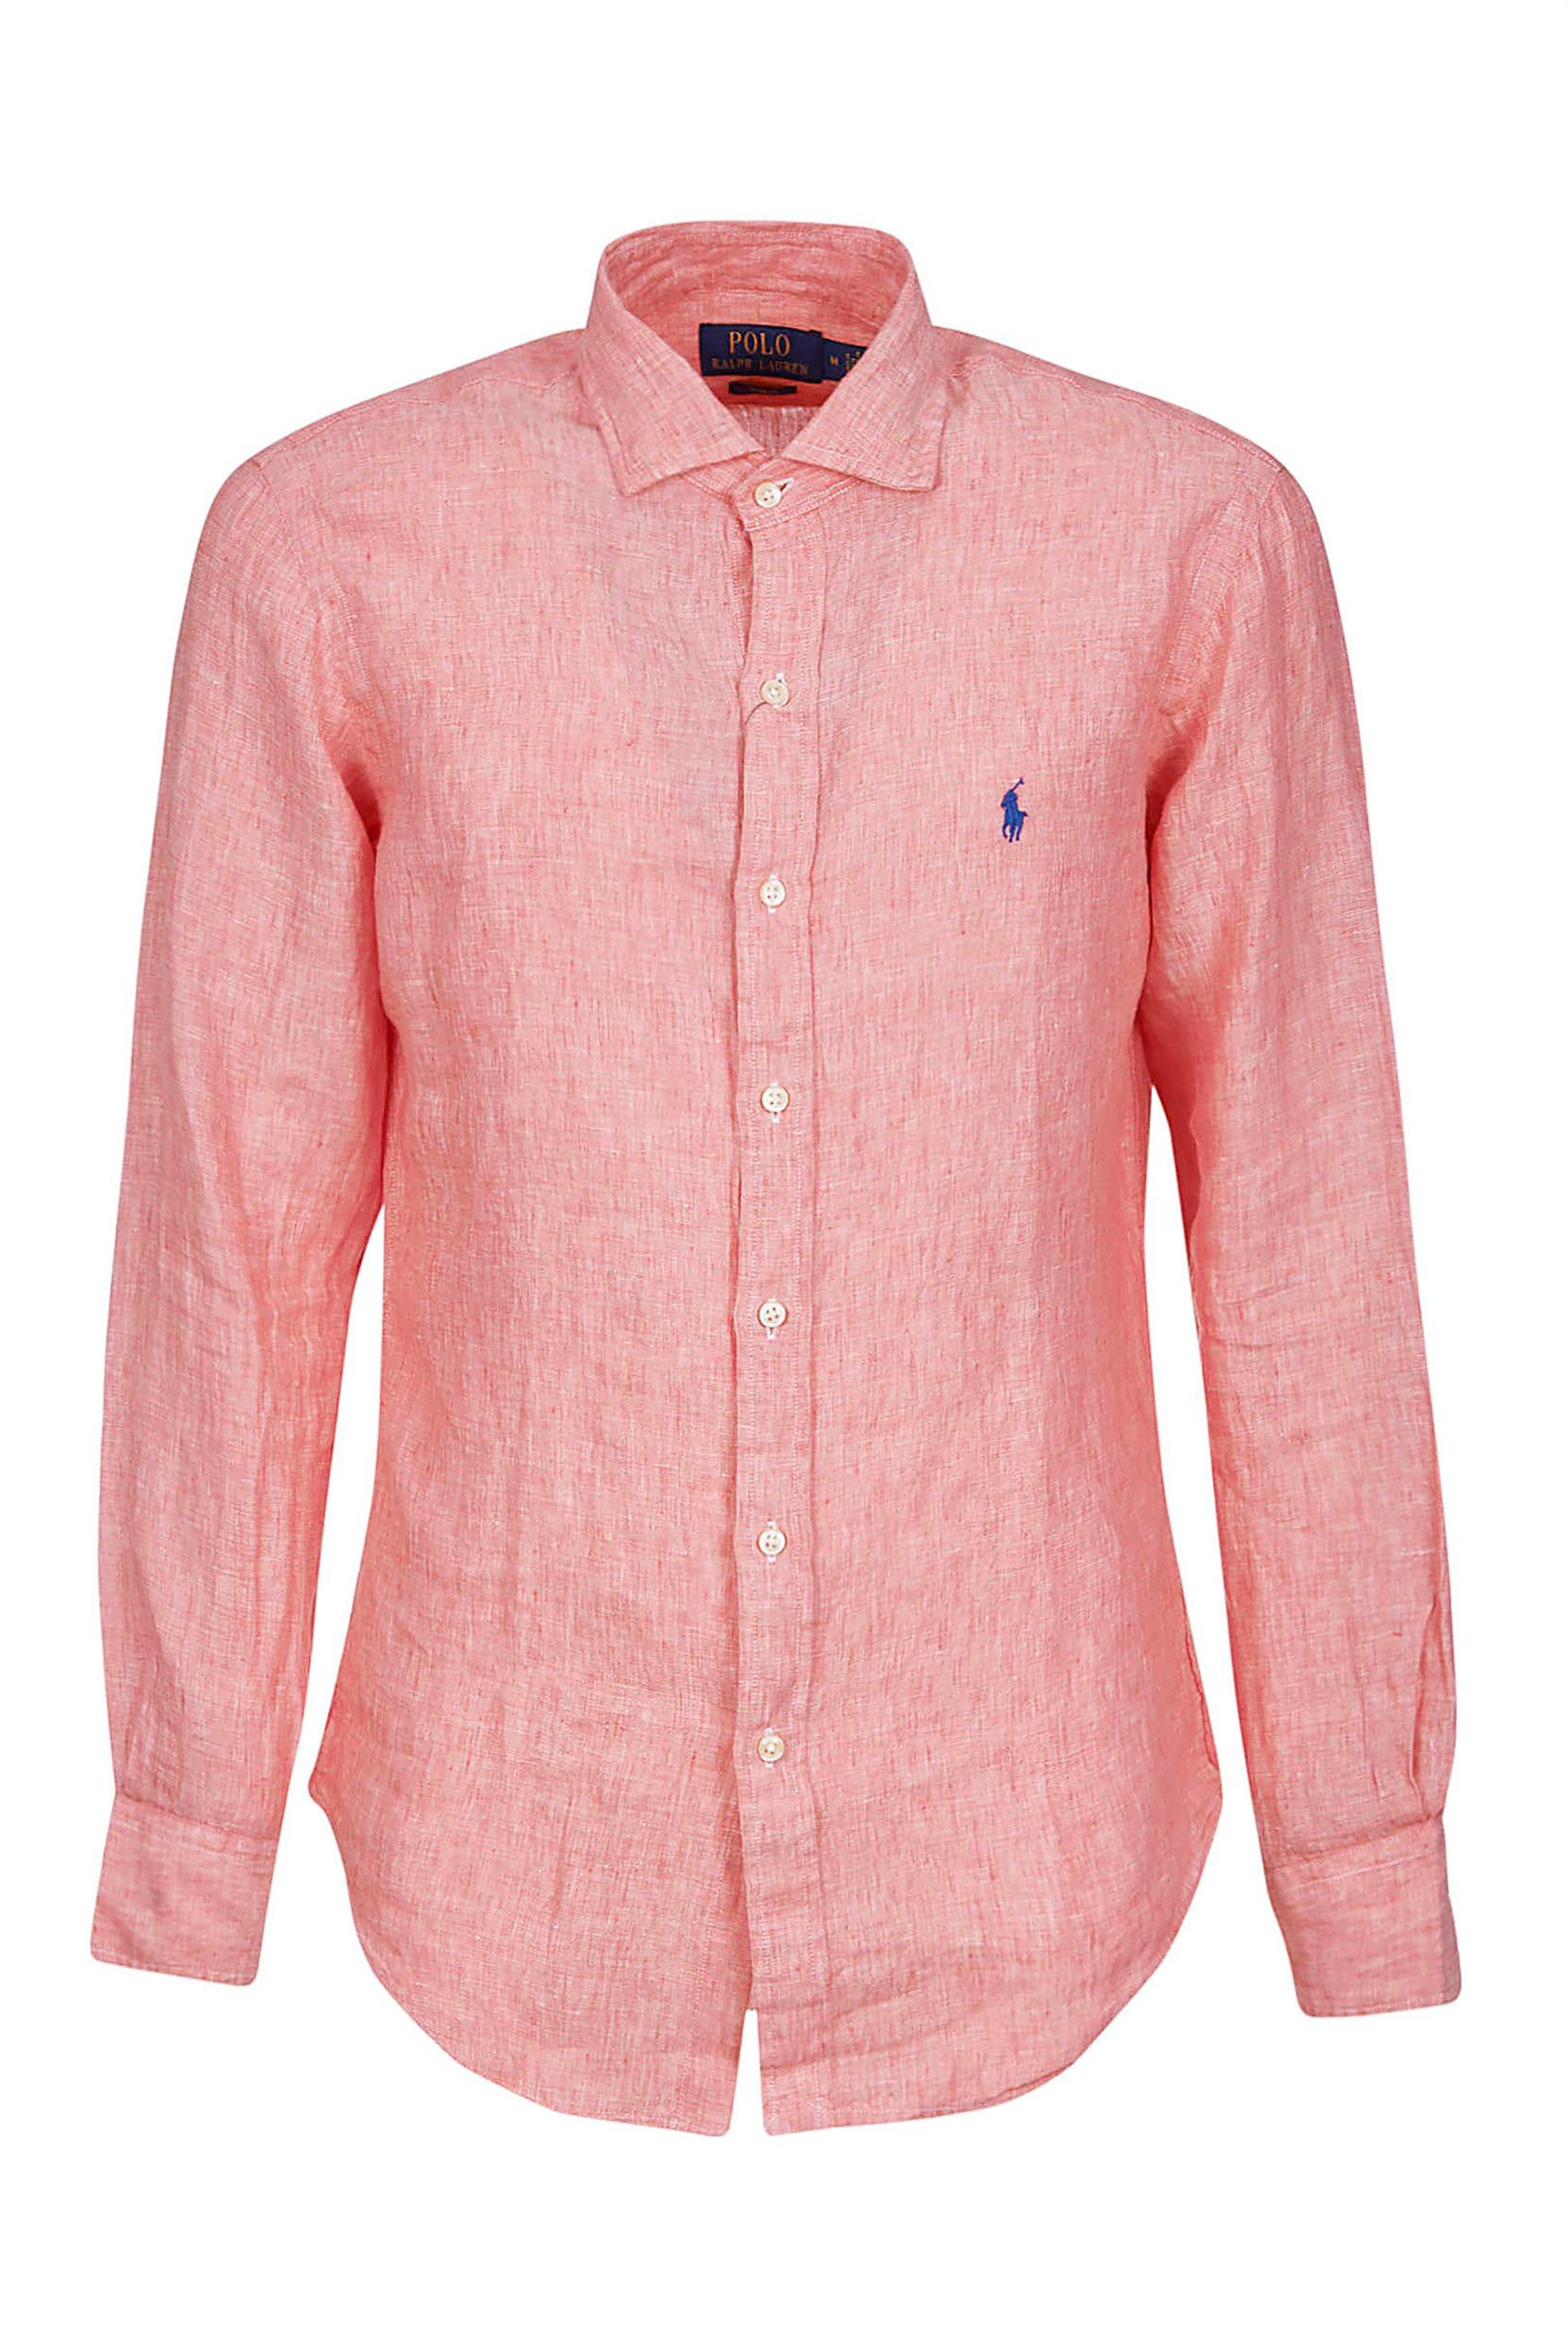 Polo Ralph Lauren ανδρικό λινό πουκάμισο με button-up γιακά - 710795426001 - Ροζ